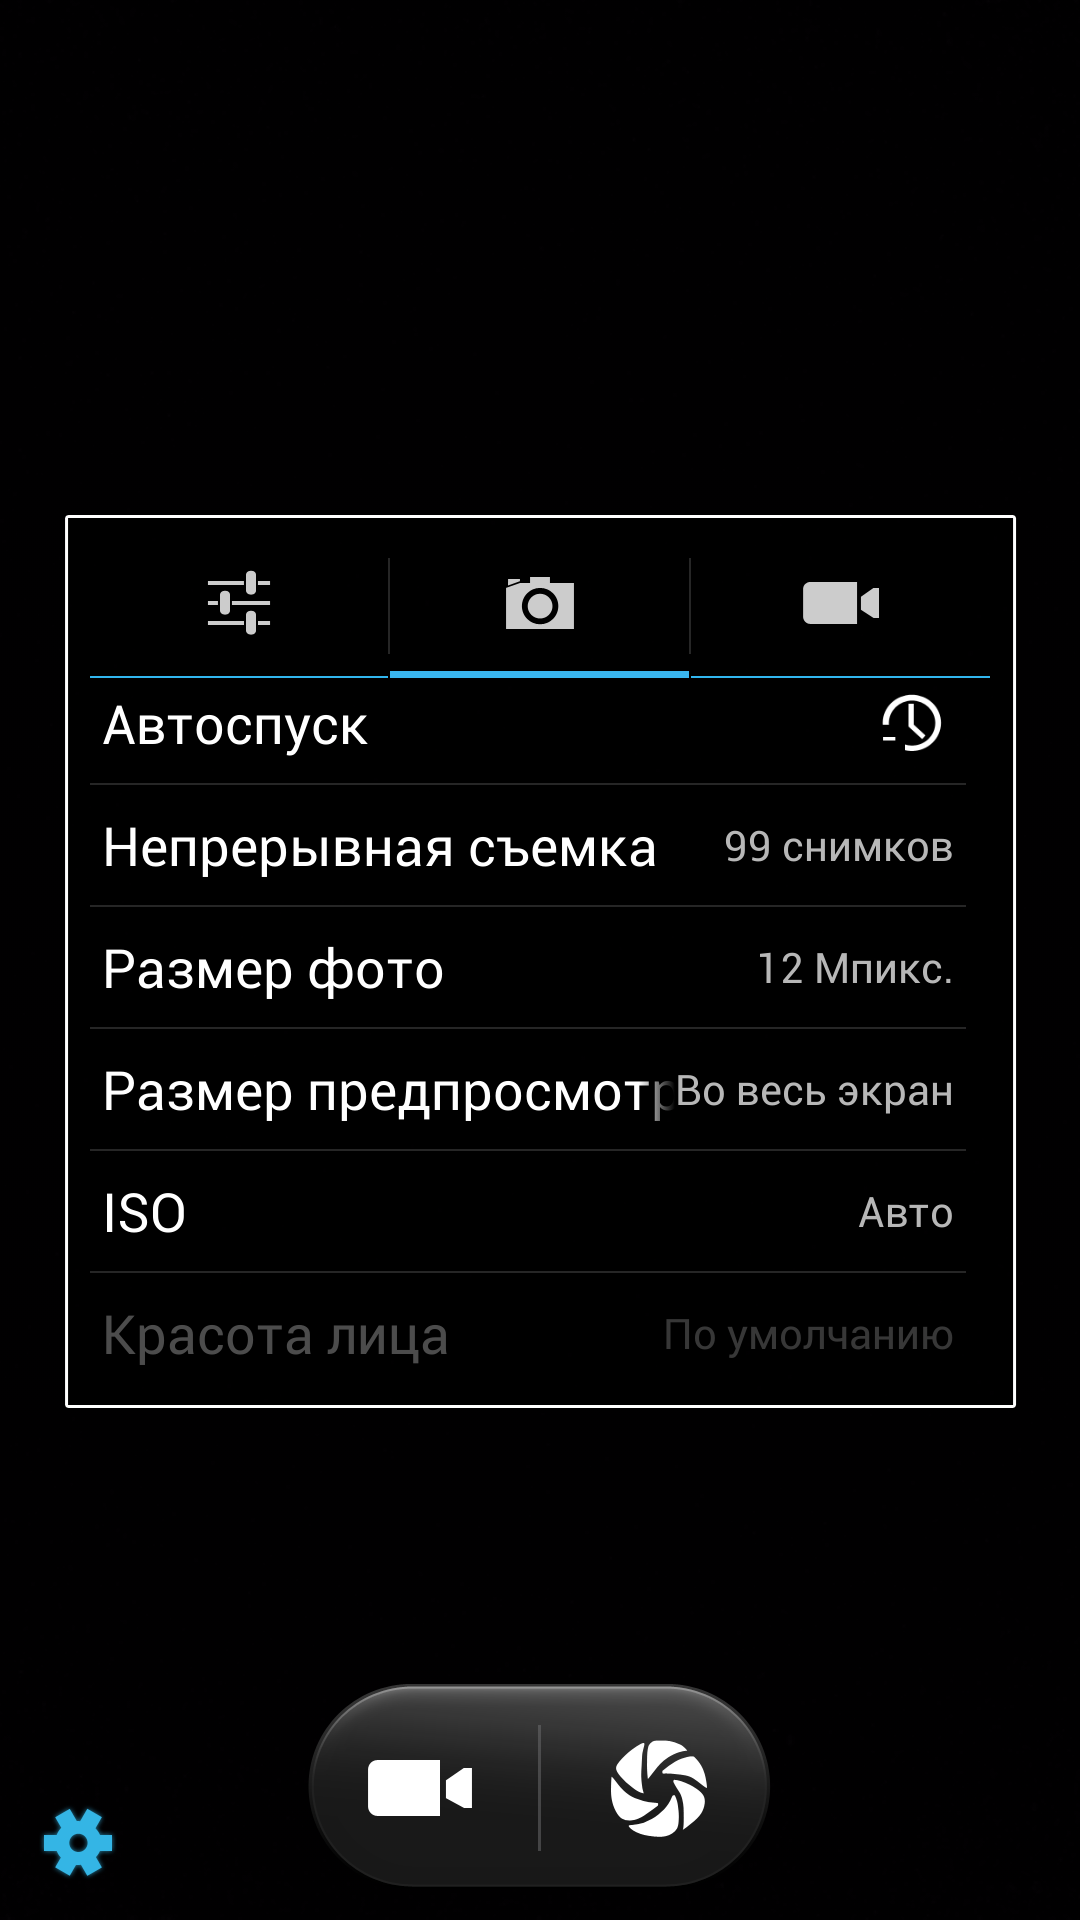 Screenshot_2014-07-11-19-59-54